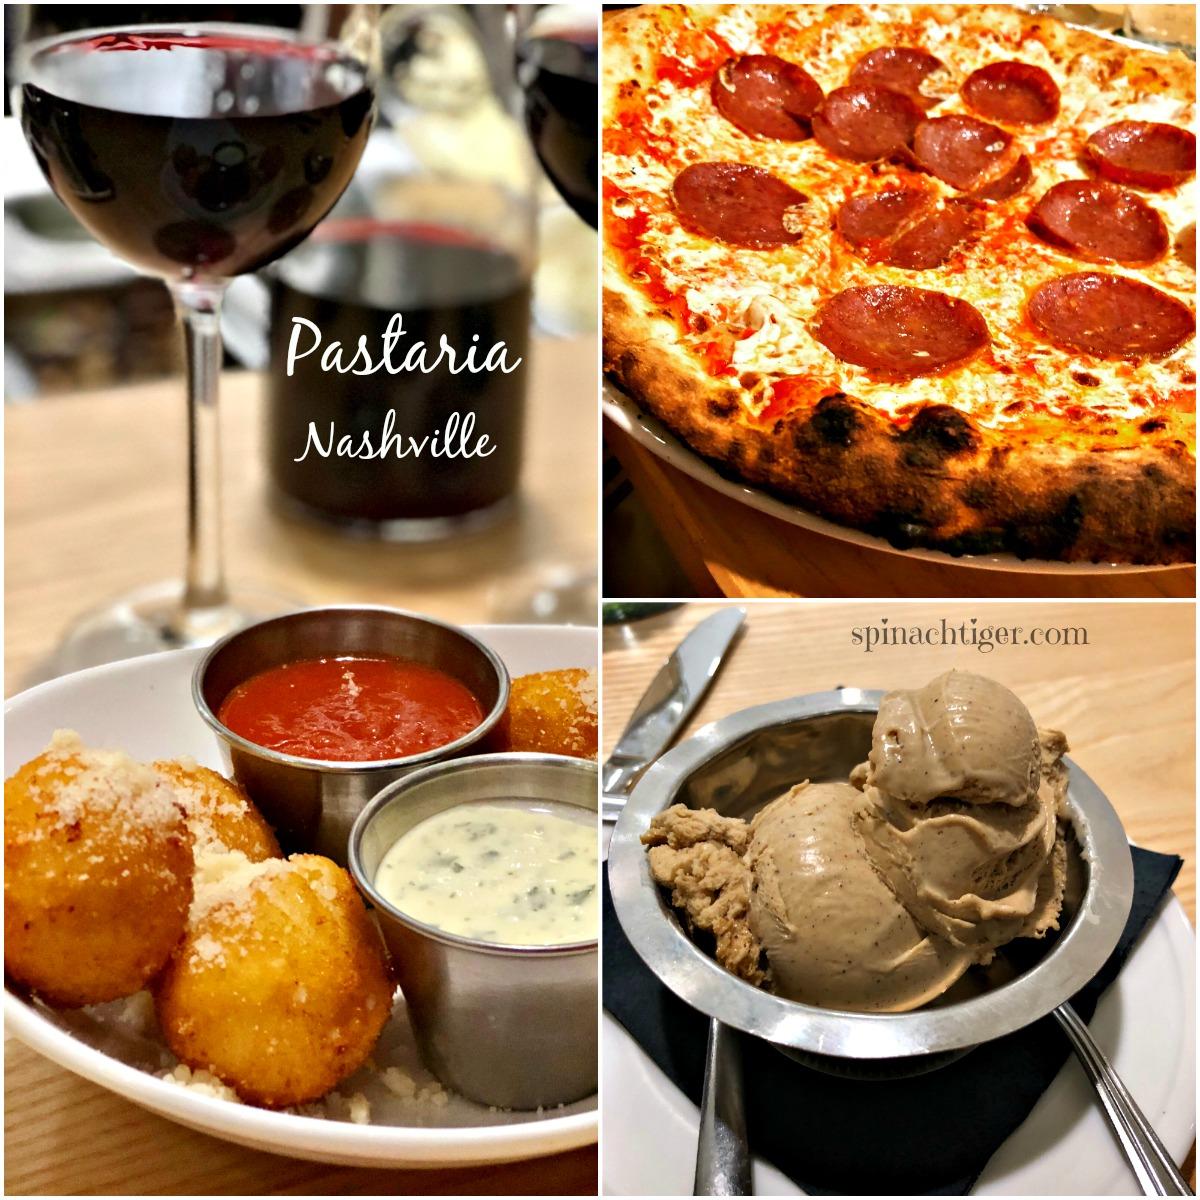 Nashville Restaurants: Pastaria from Spinach Tiger